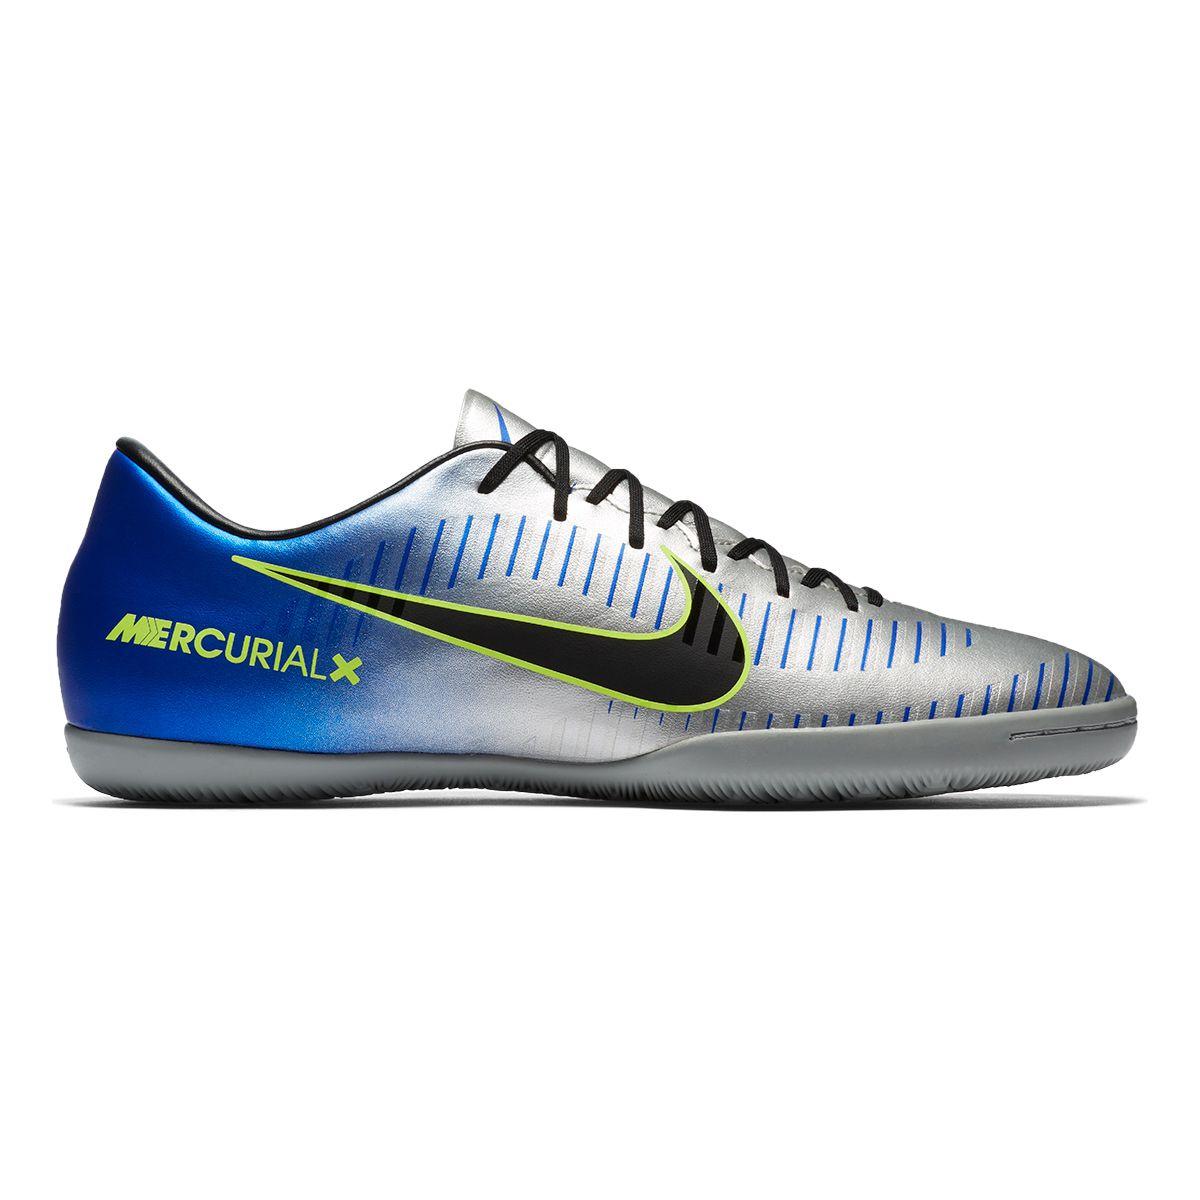 051c4da30606d Chuteira Futsal Nike Mercurialx Victory Vi Ic - BRACIA SHOP  Loja de ...